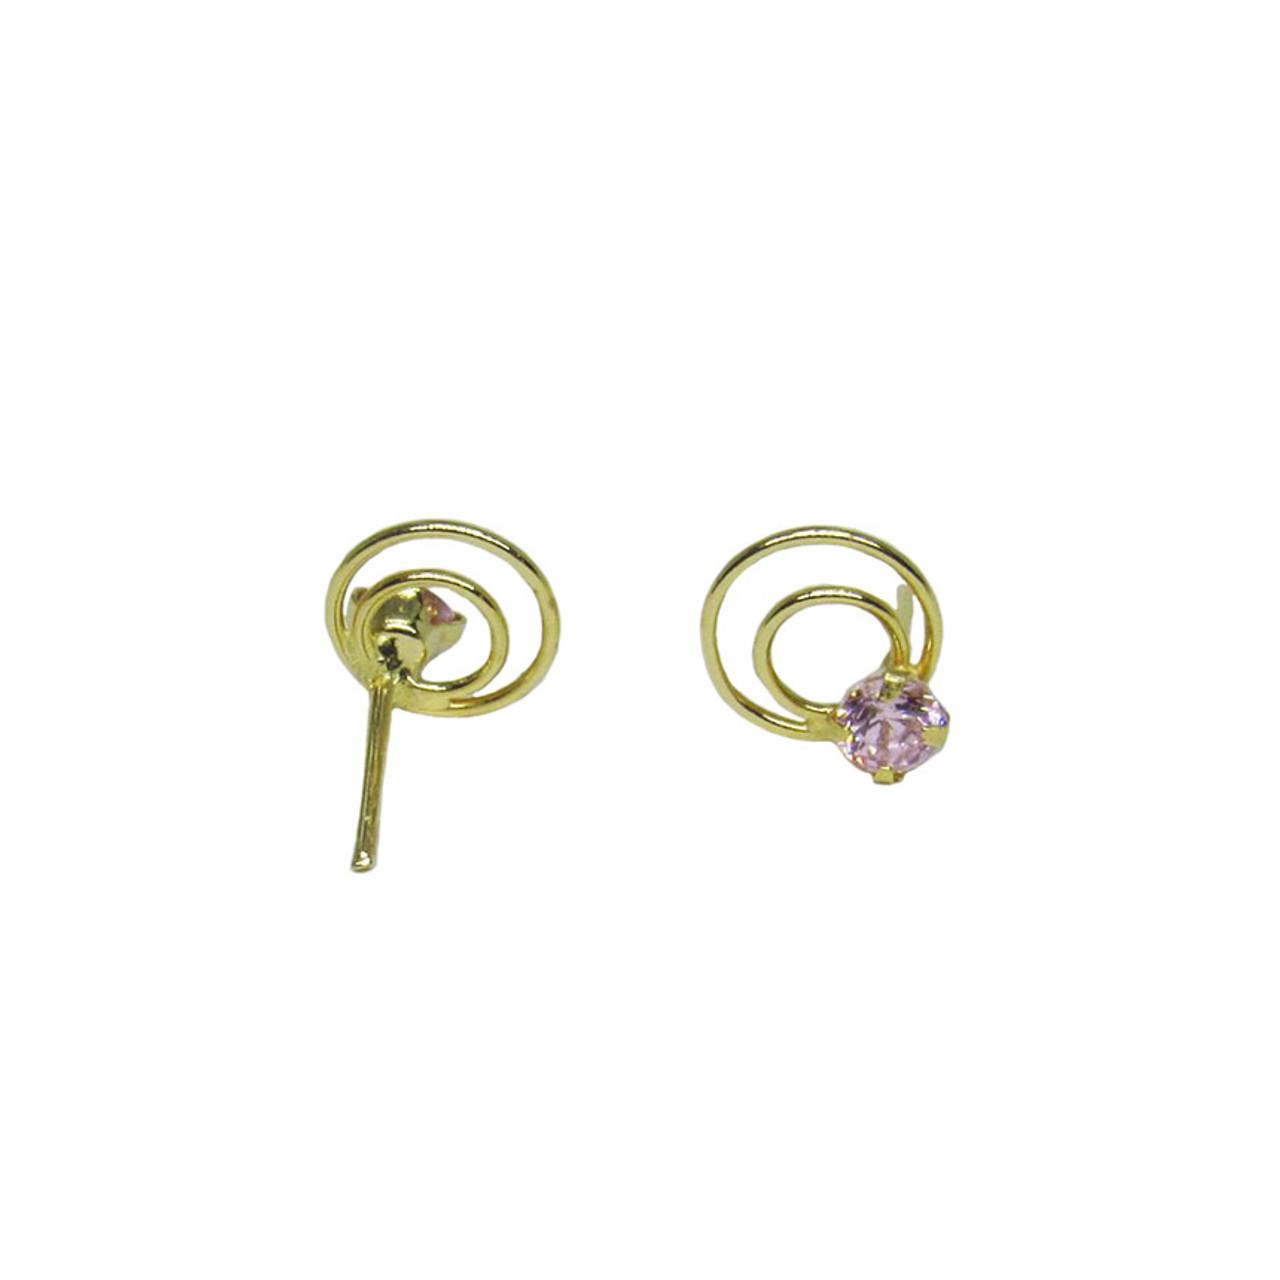 Brinco de ouro 18k Infantil Spiral Zircônia 6,60mm (CJBR-00000330) 5843603b31